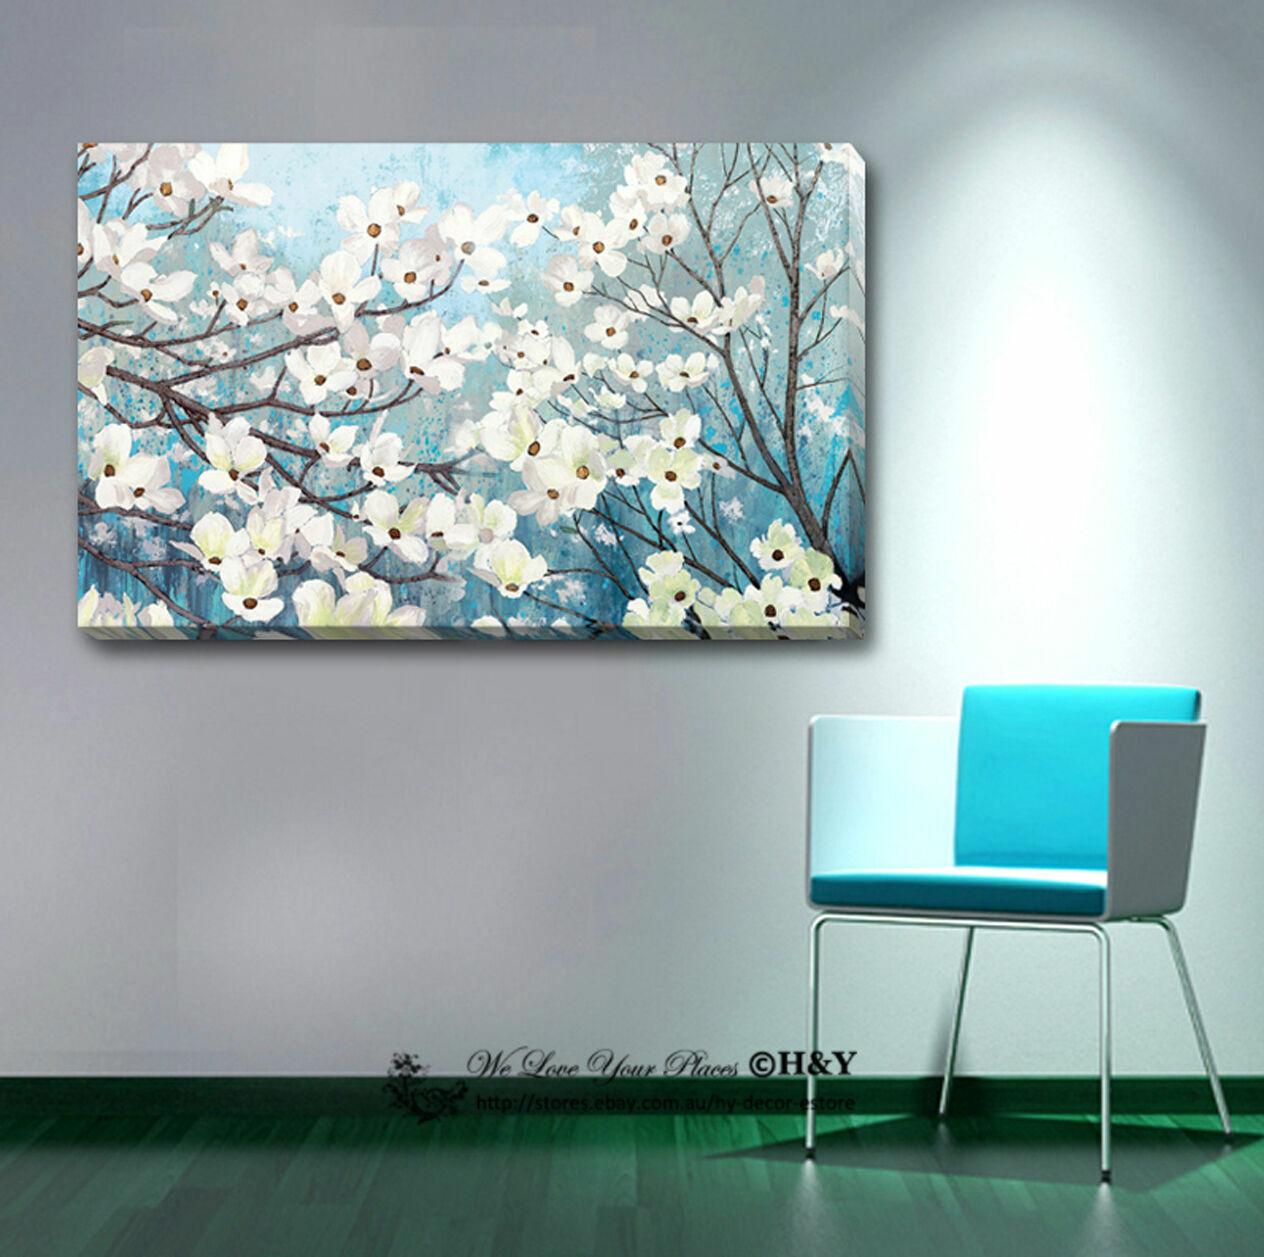 Blossom Stretched Canvas Drucken Framed Wand Kunst Home Office Decor Gift Blau Weiß